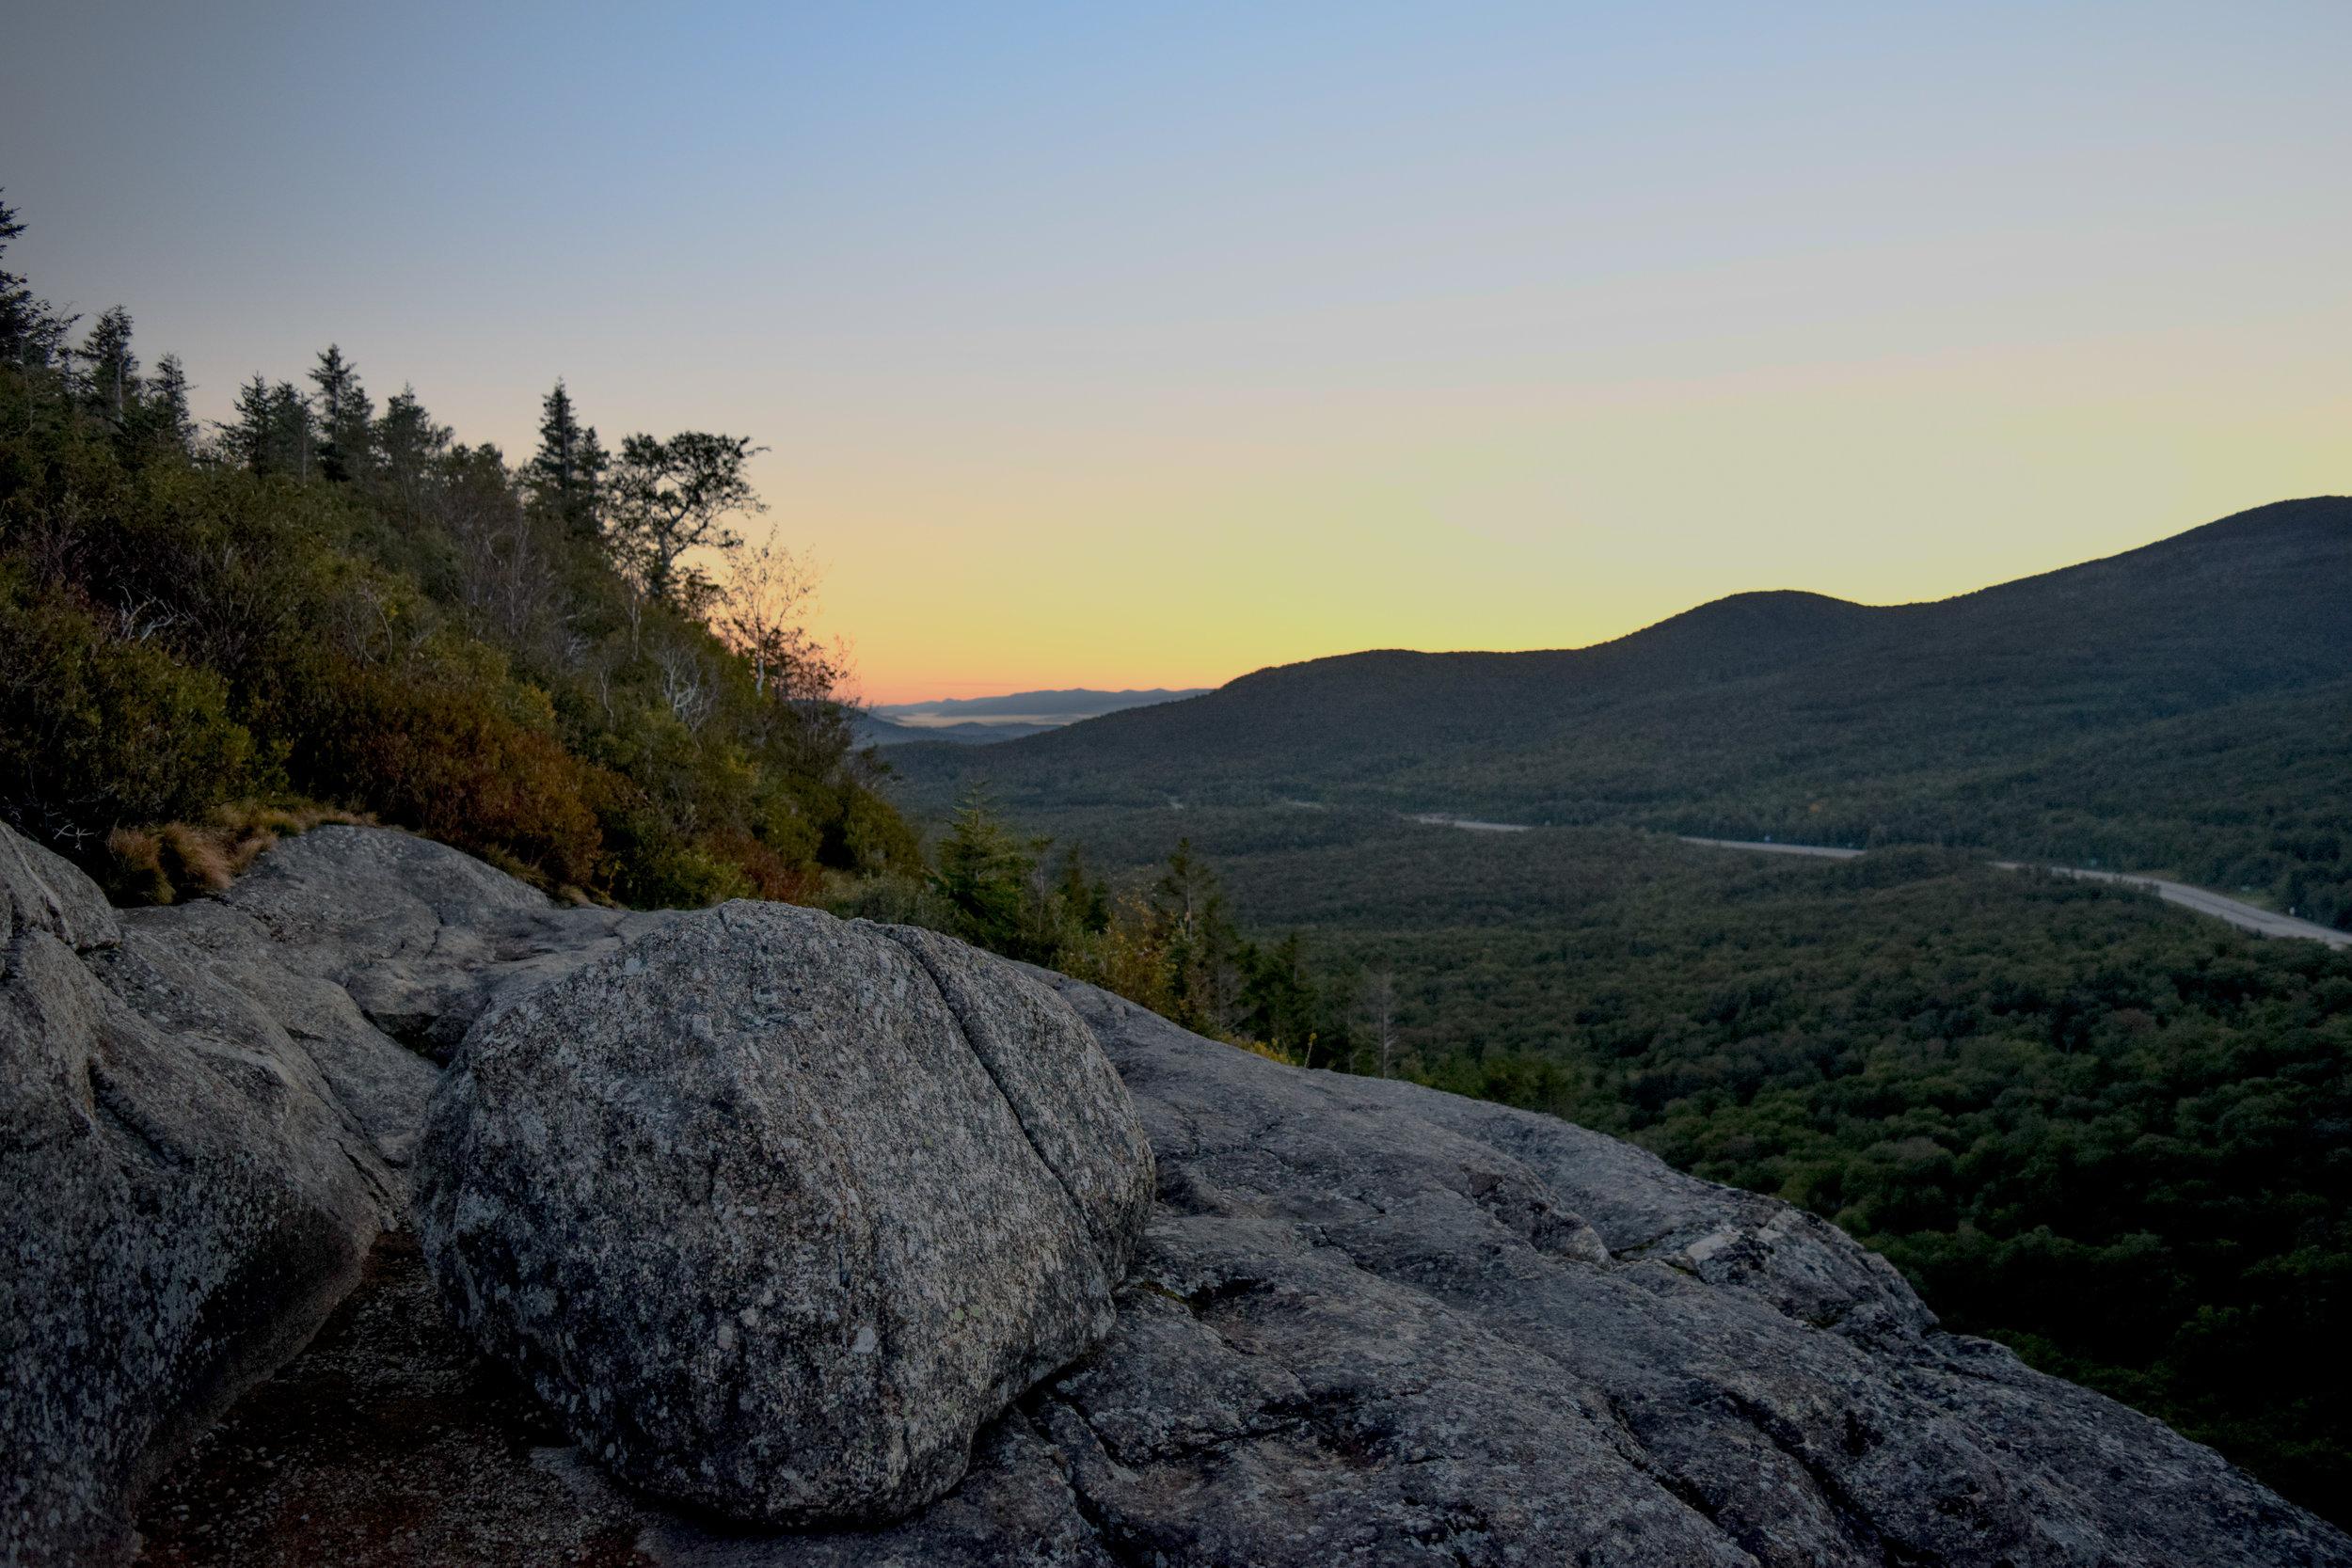 Sunrise over Artists Bluff